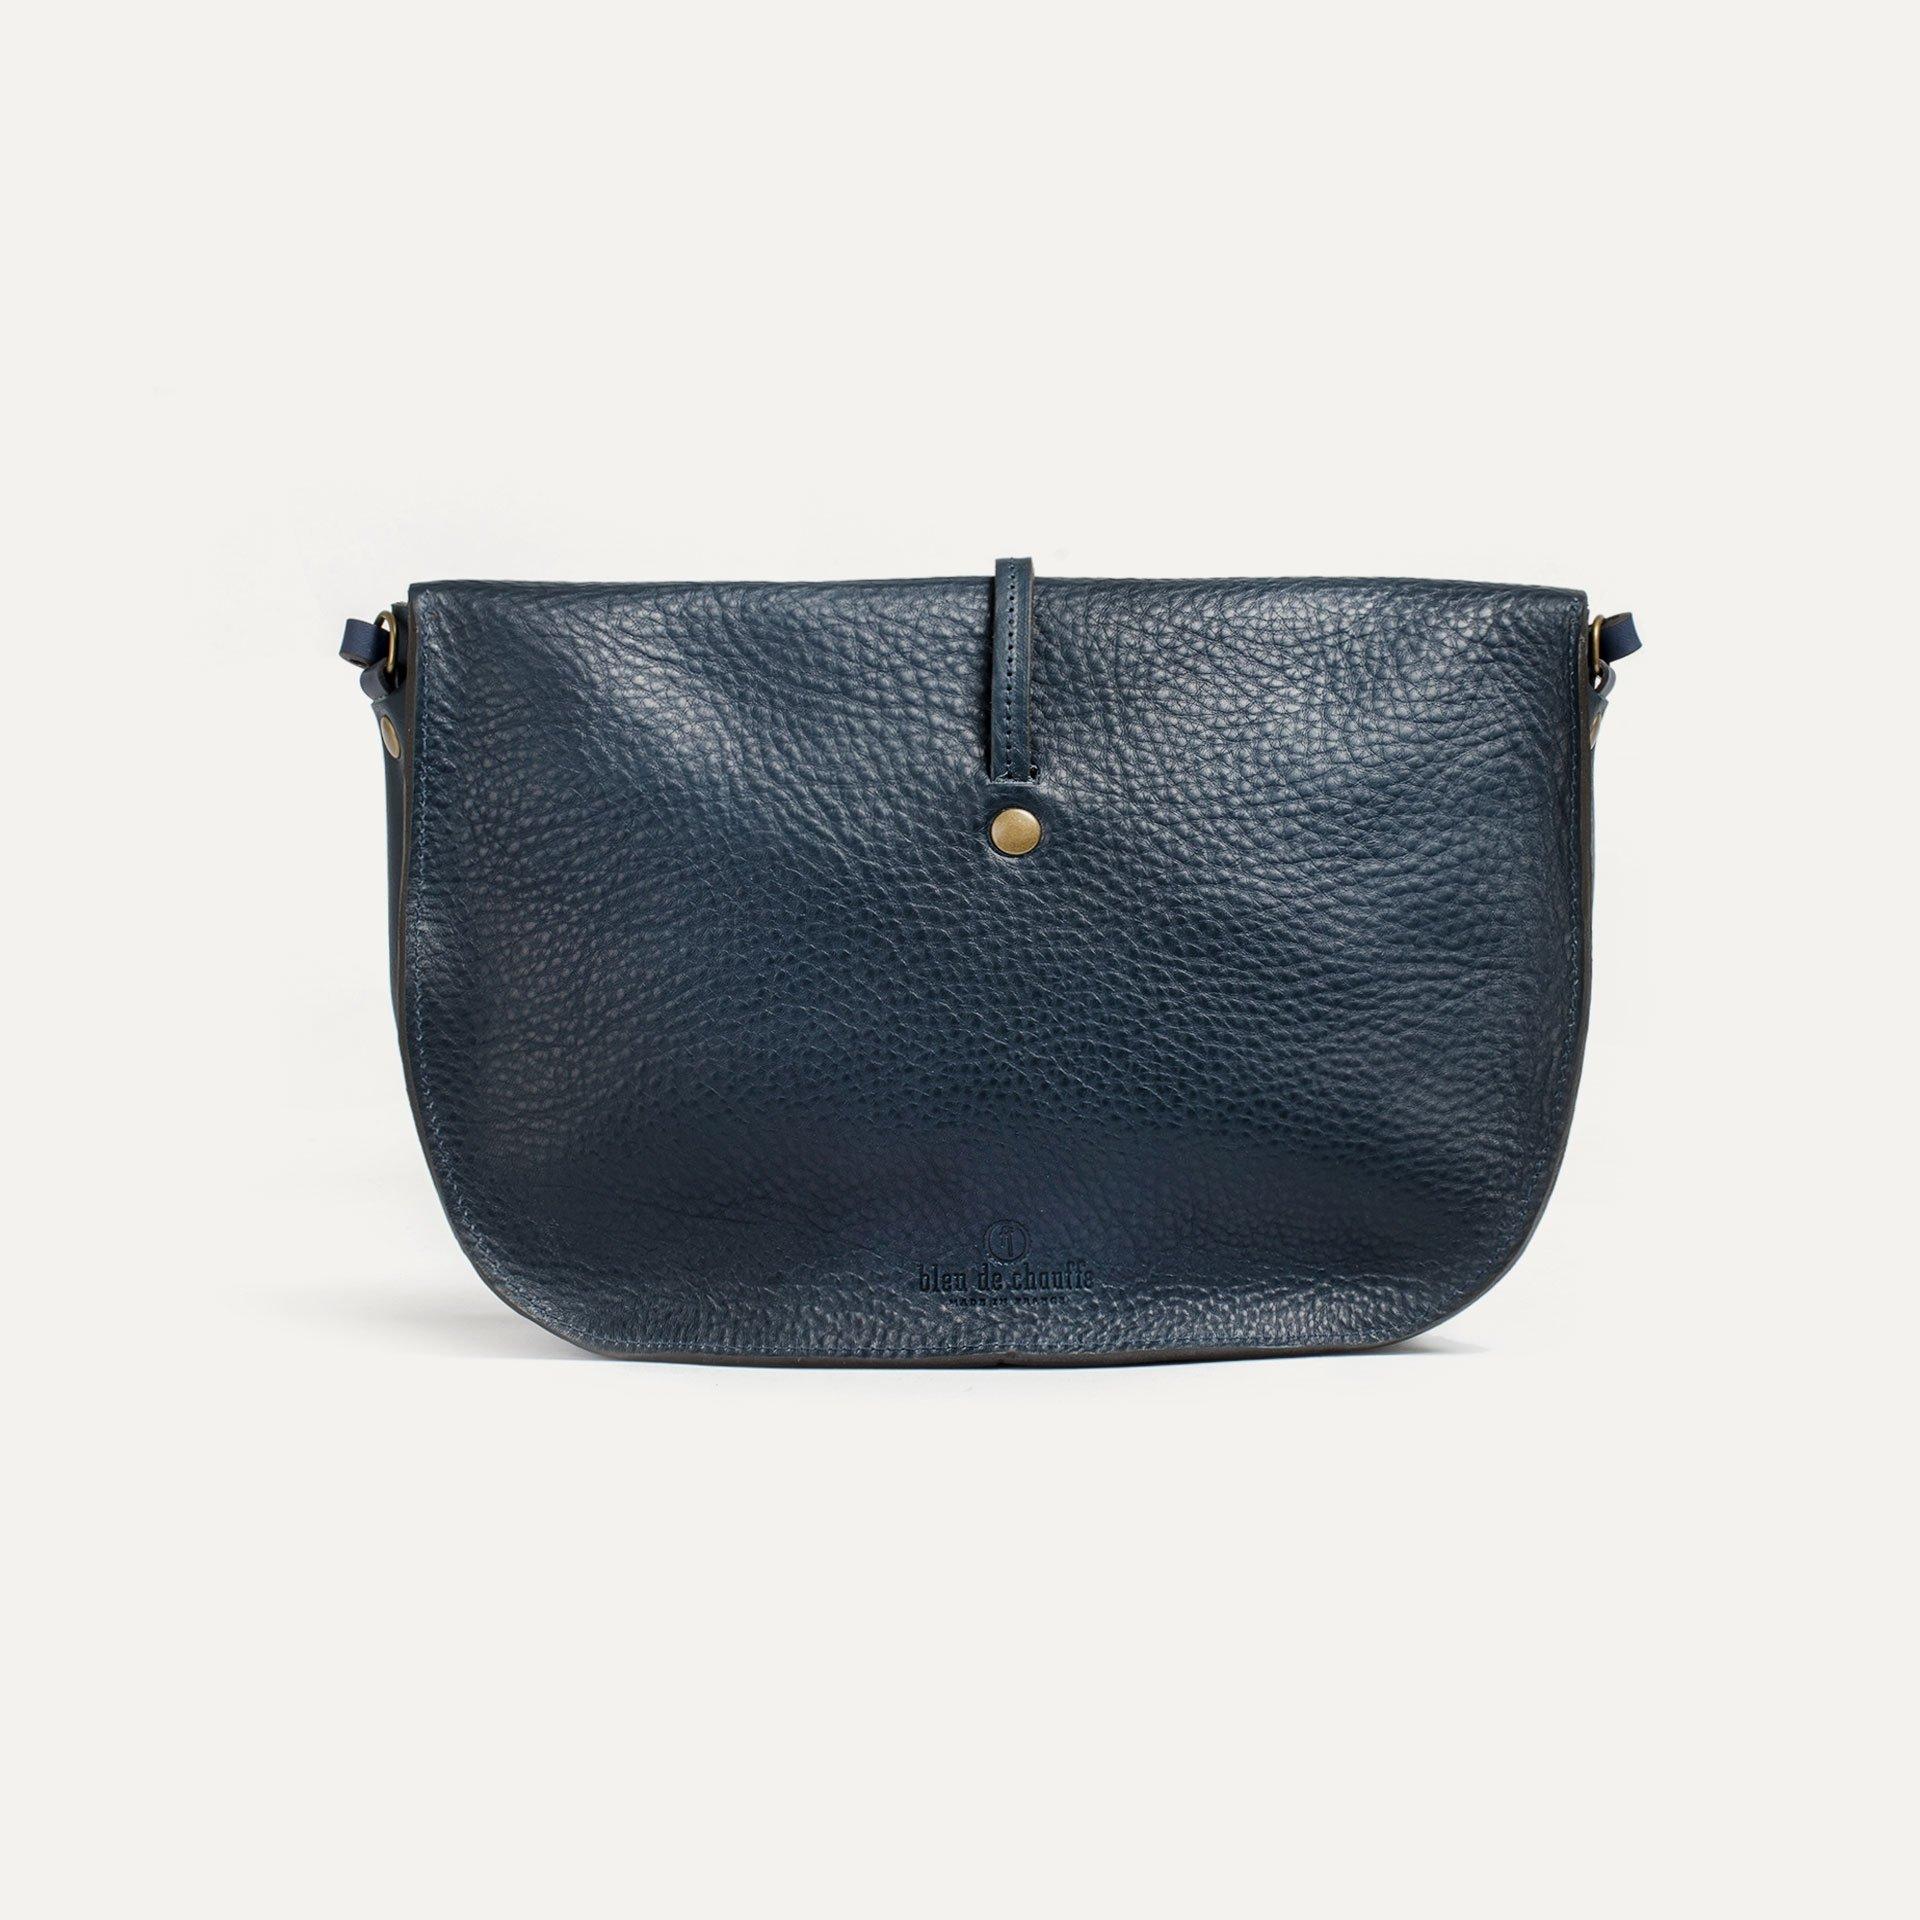 Pastis handbag - Navy Blue (image n°3)